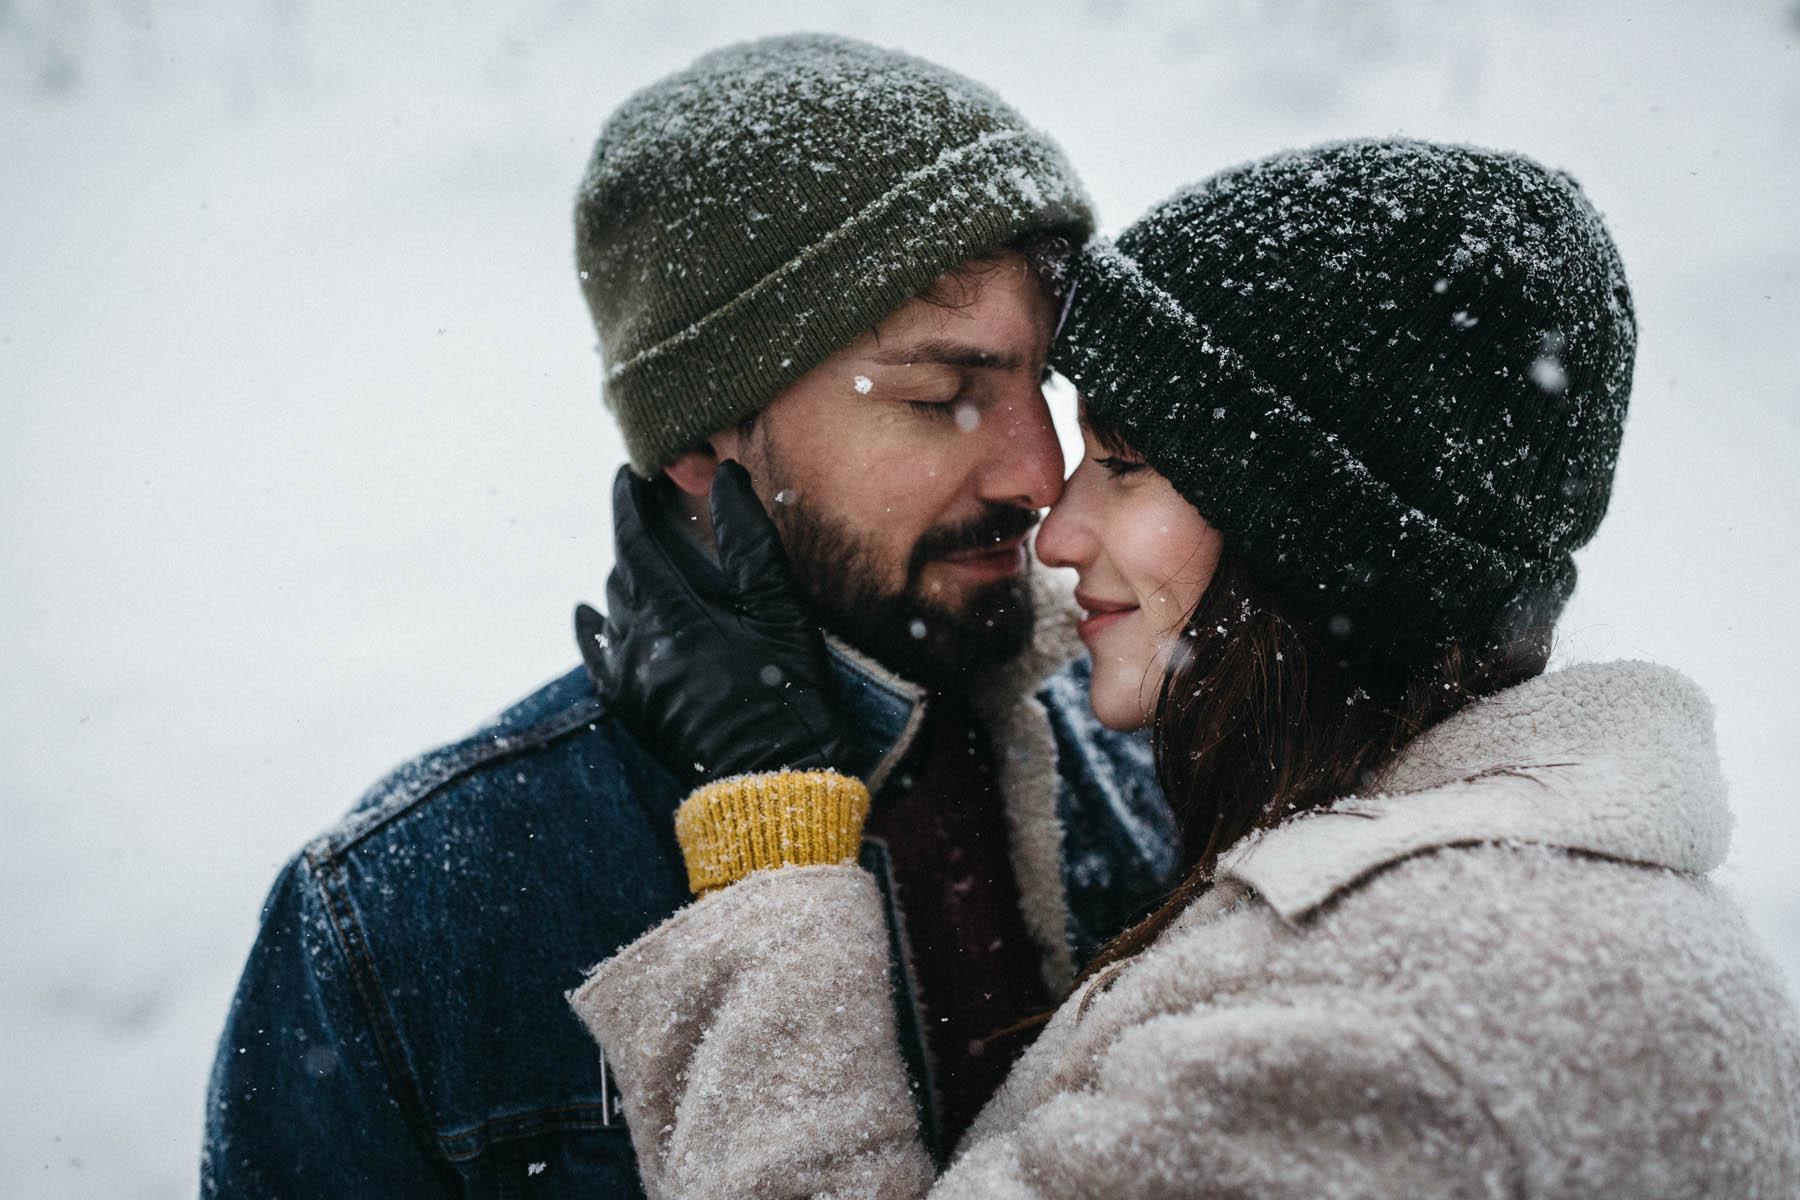 raissa simon fotografie paarshooting nais andre winter schwarzwaldhochstrasse 52 - Naïs + André